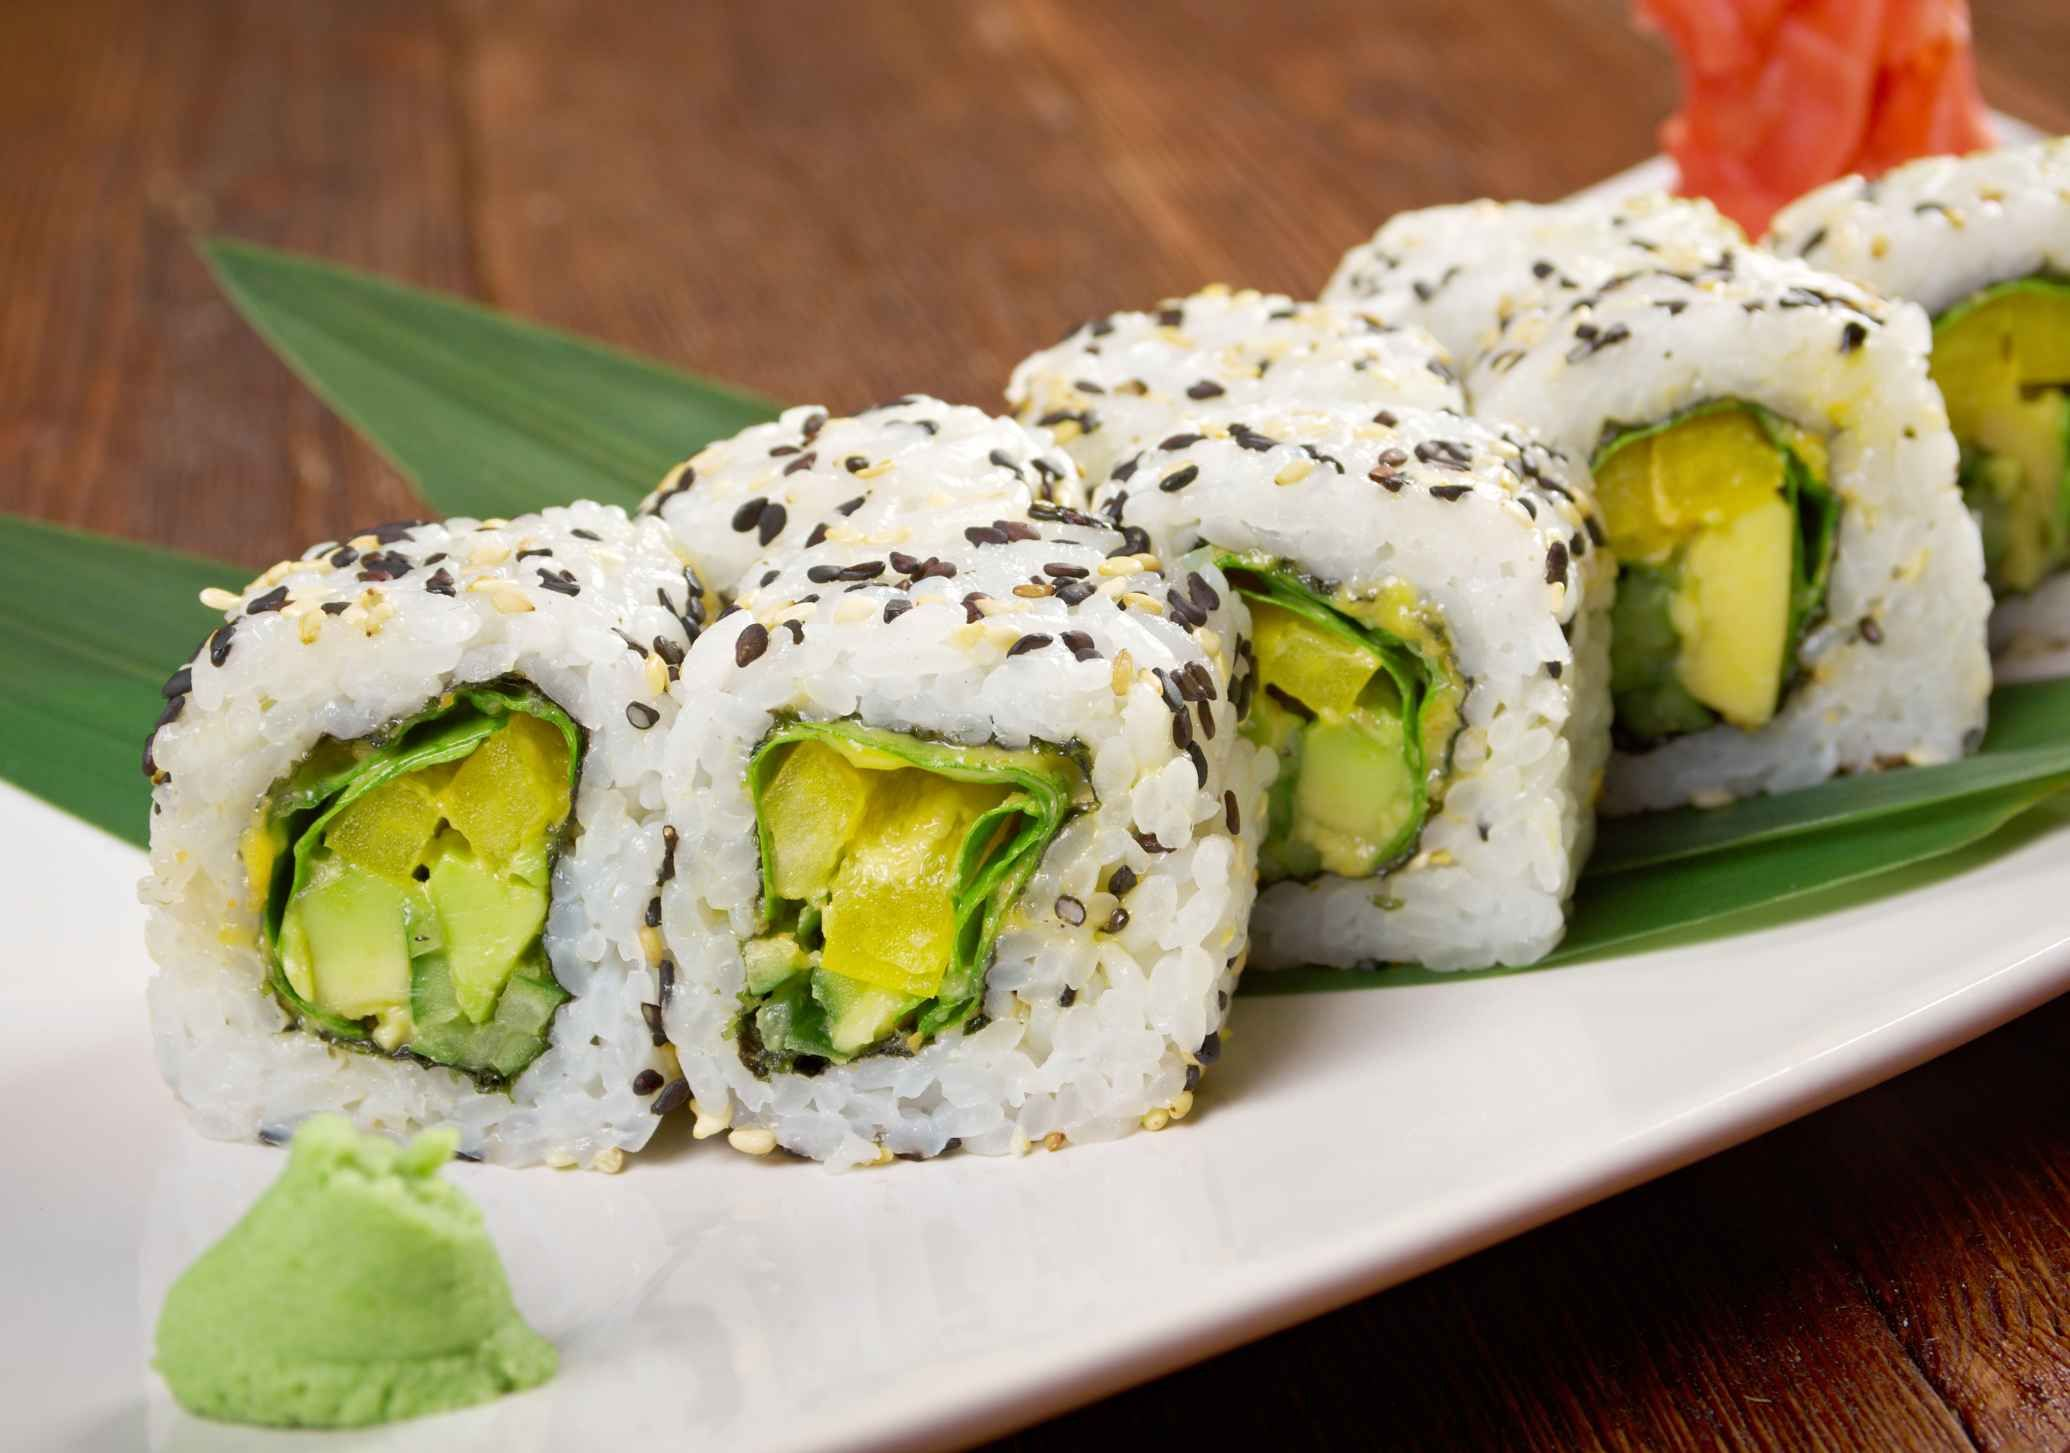 Can Pregnant Women Have Vegetable Sushi? | Vegetarian ...